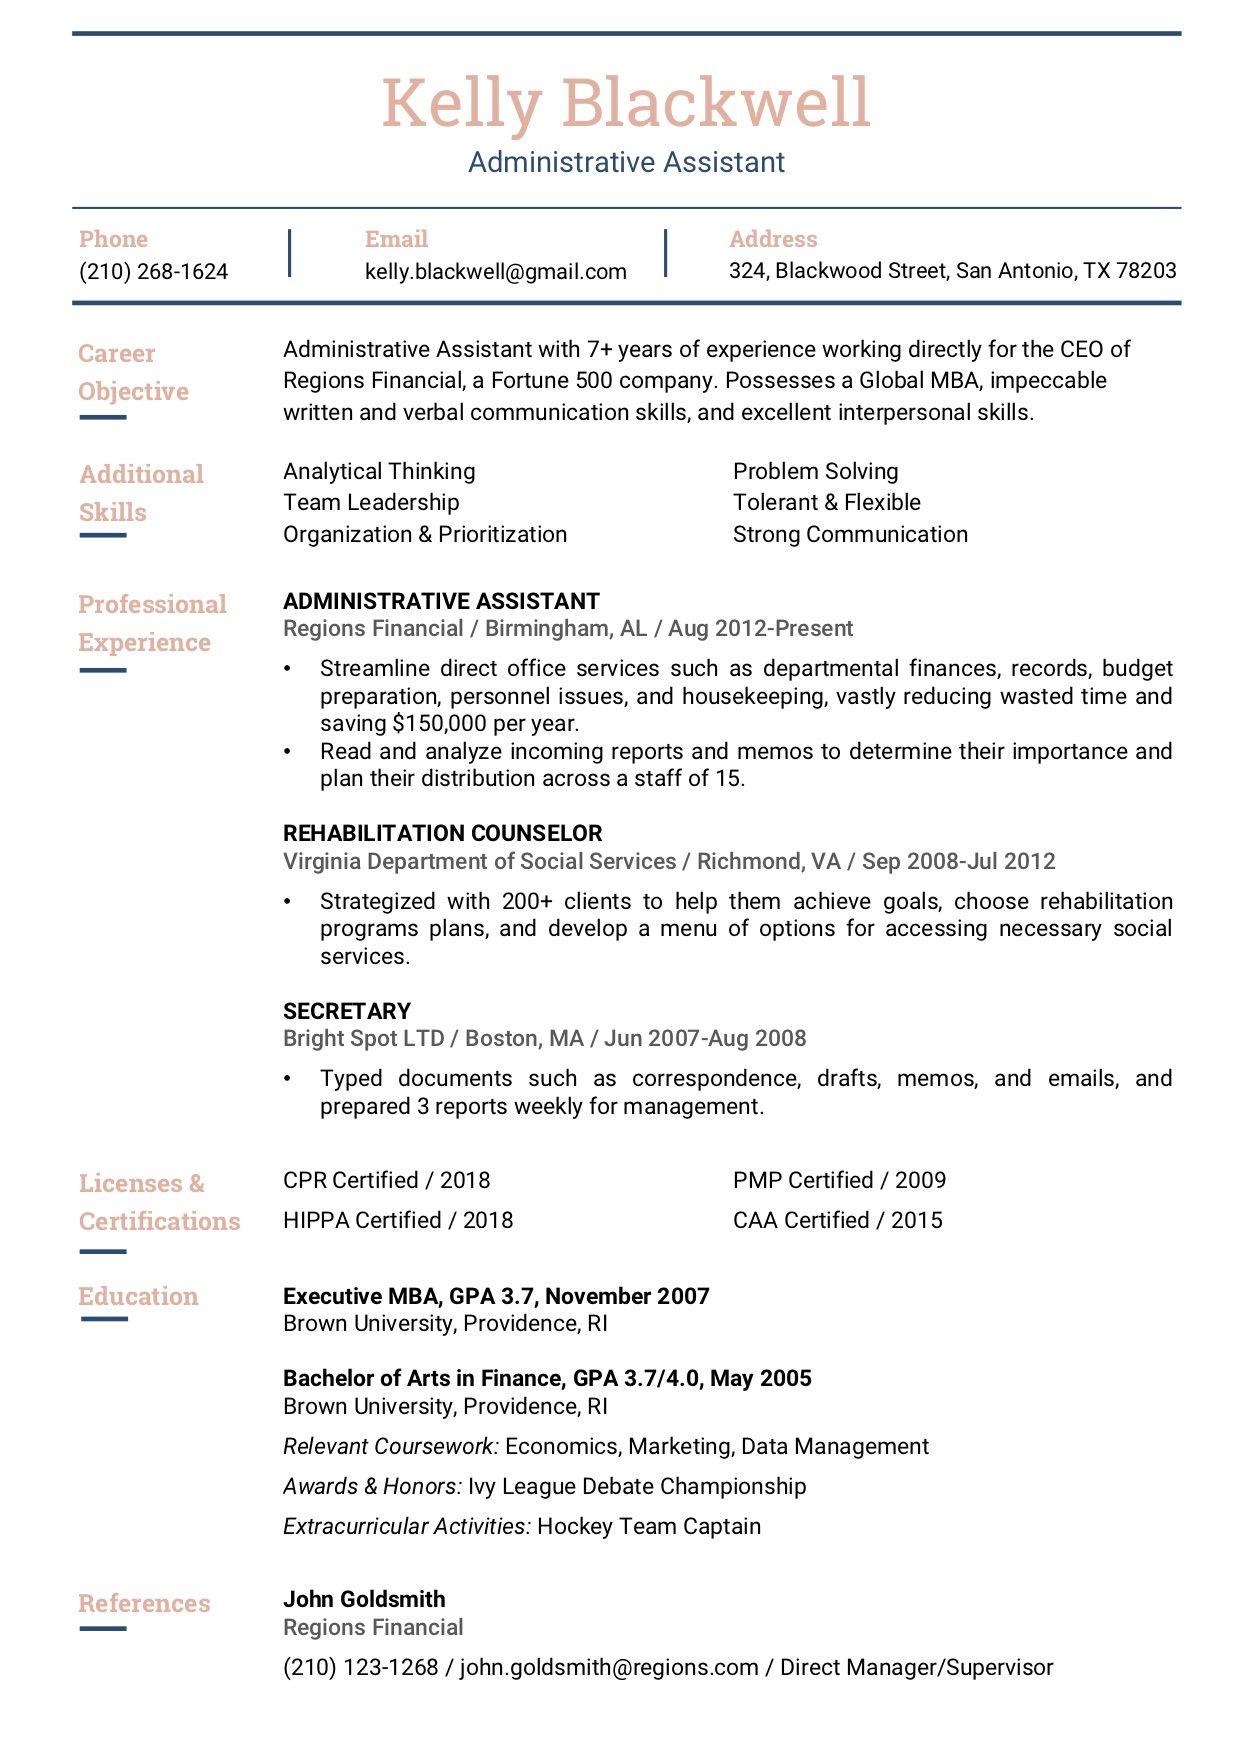 Resume Template 7c Rc Resume Template Professional Creative Resume Resume Templates